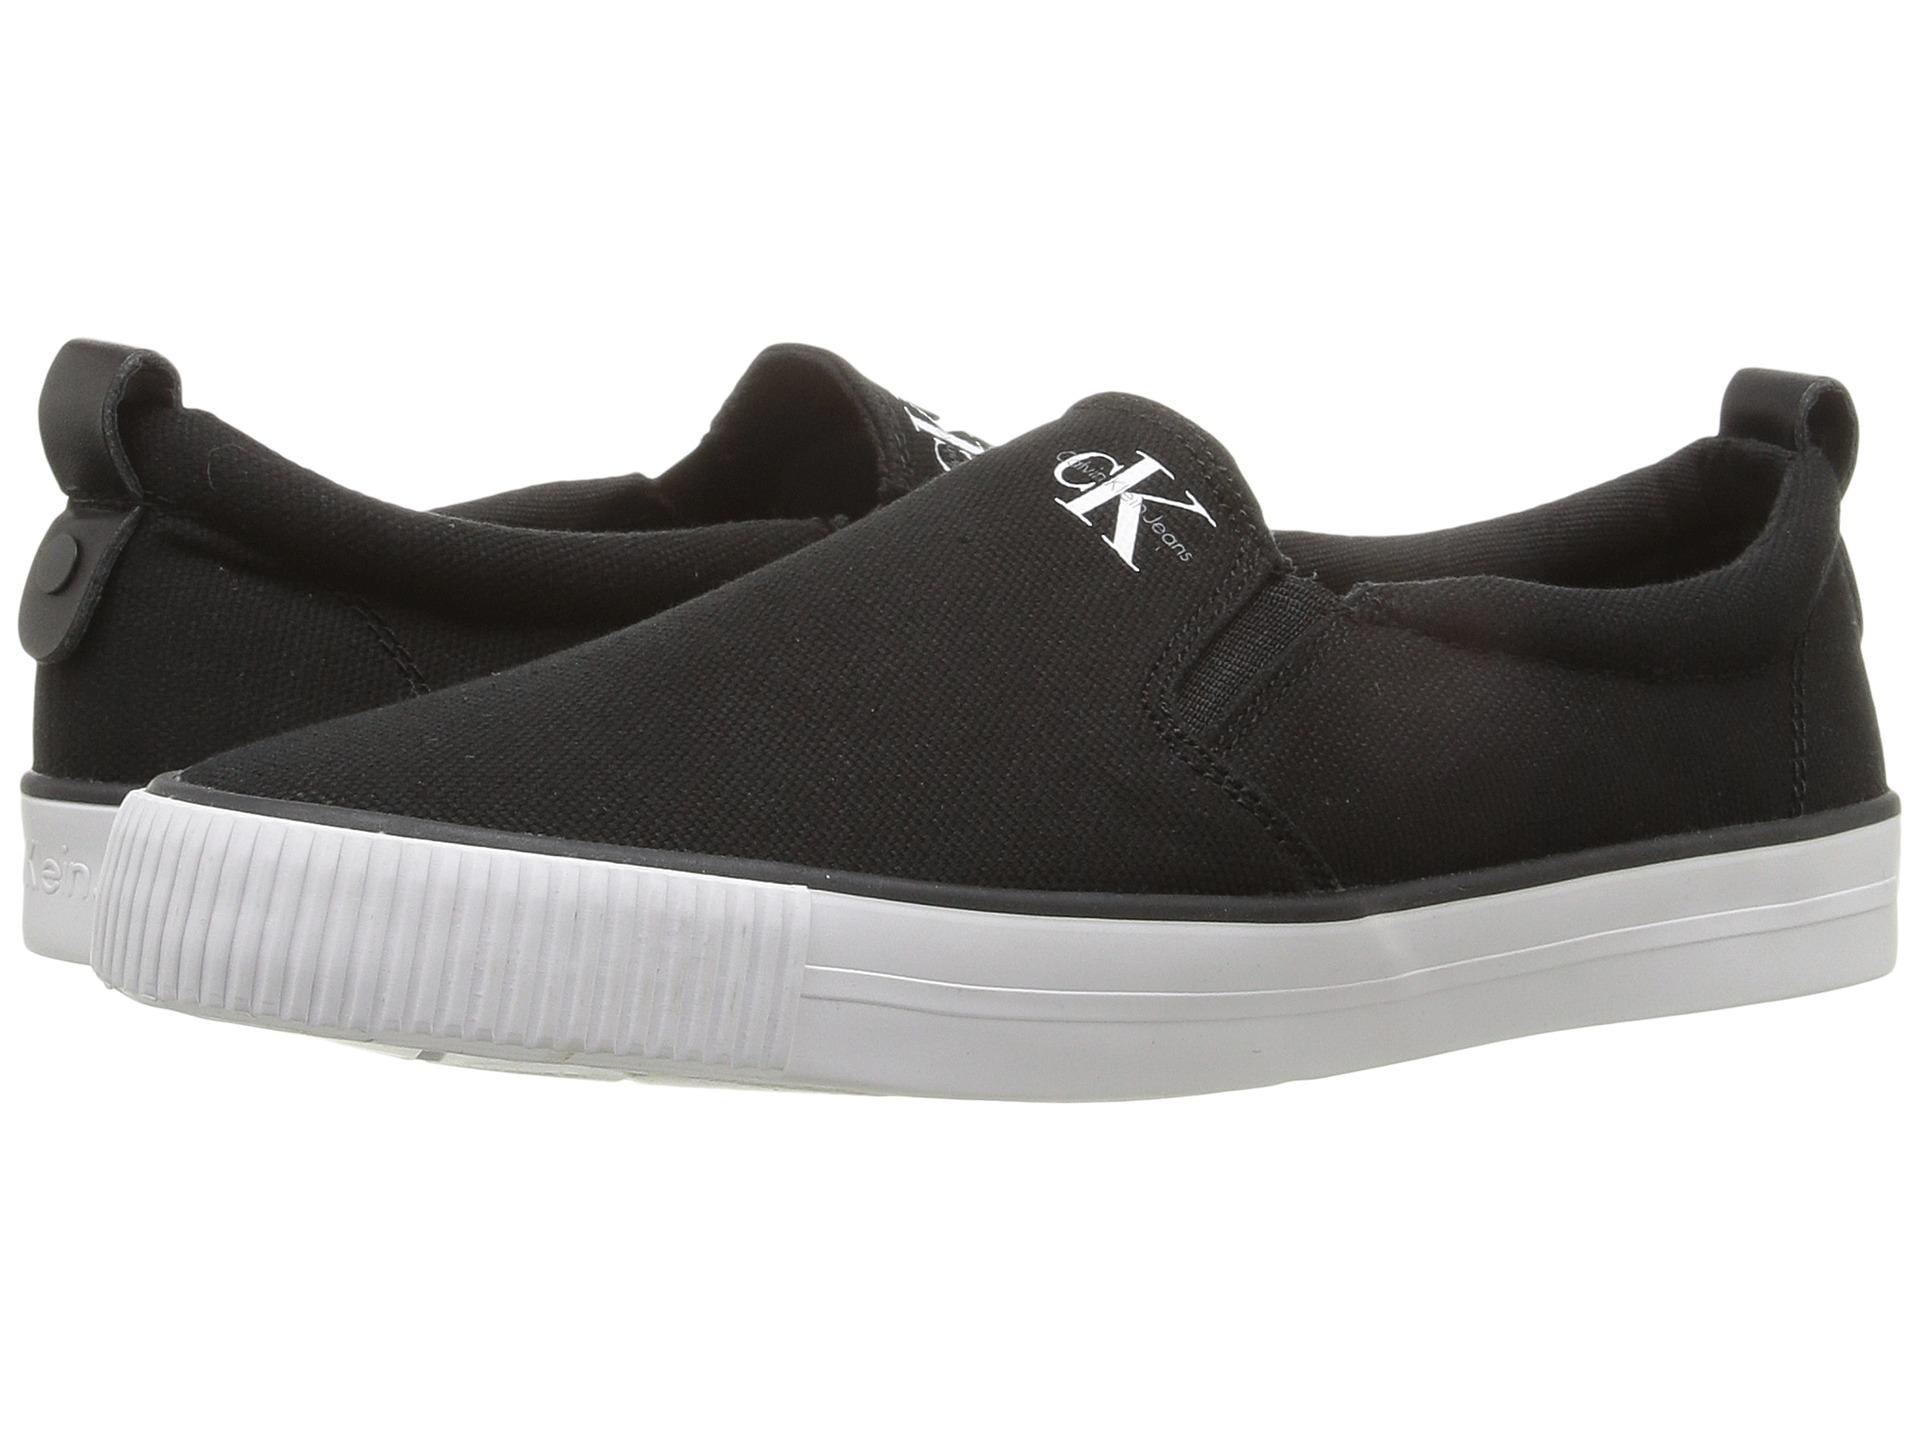 Calvin Klein Dolly Shoes Black